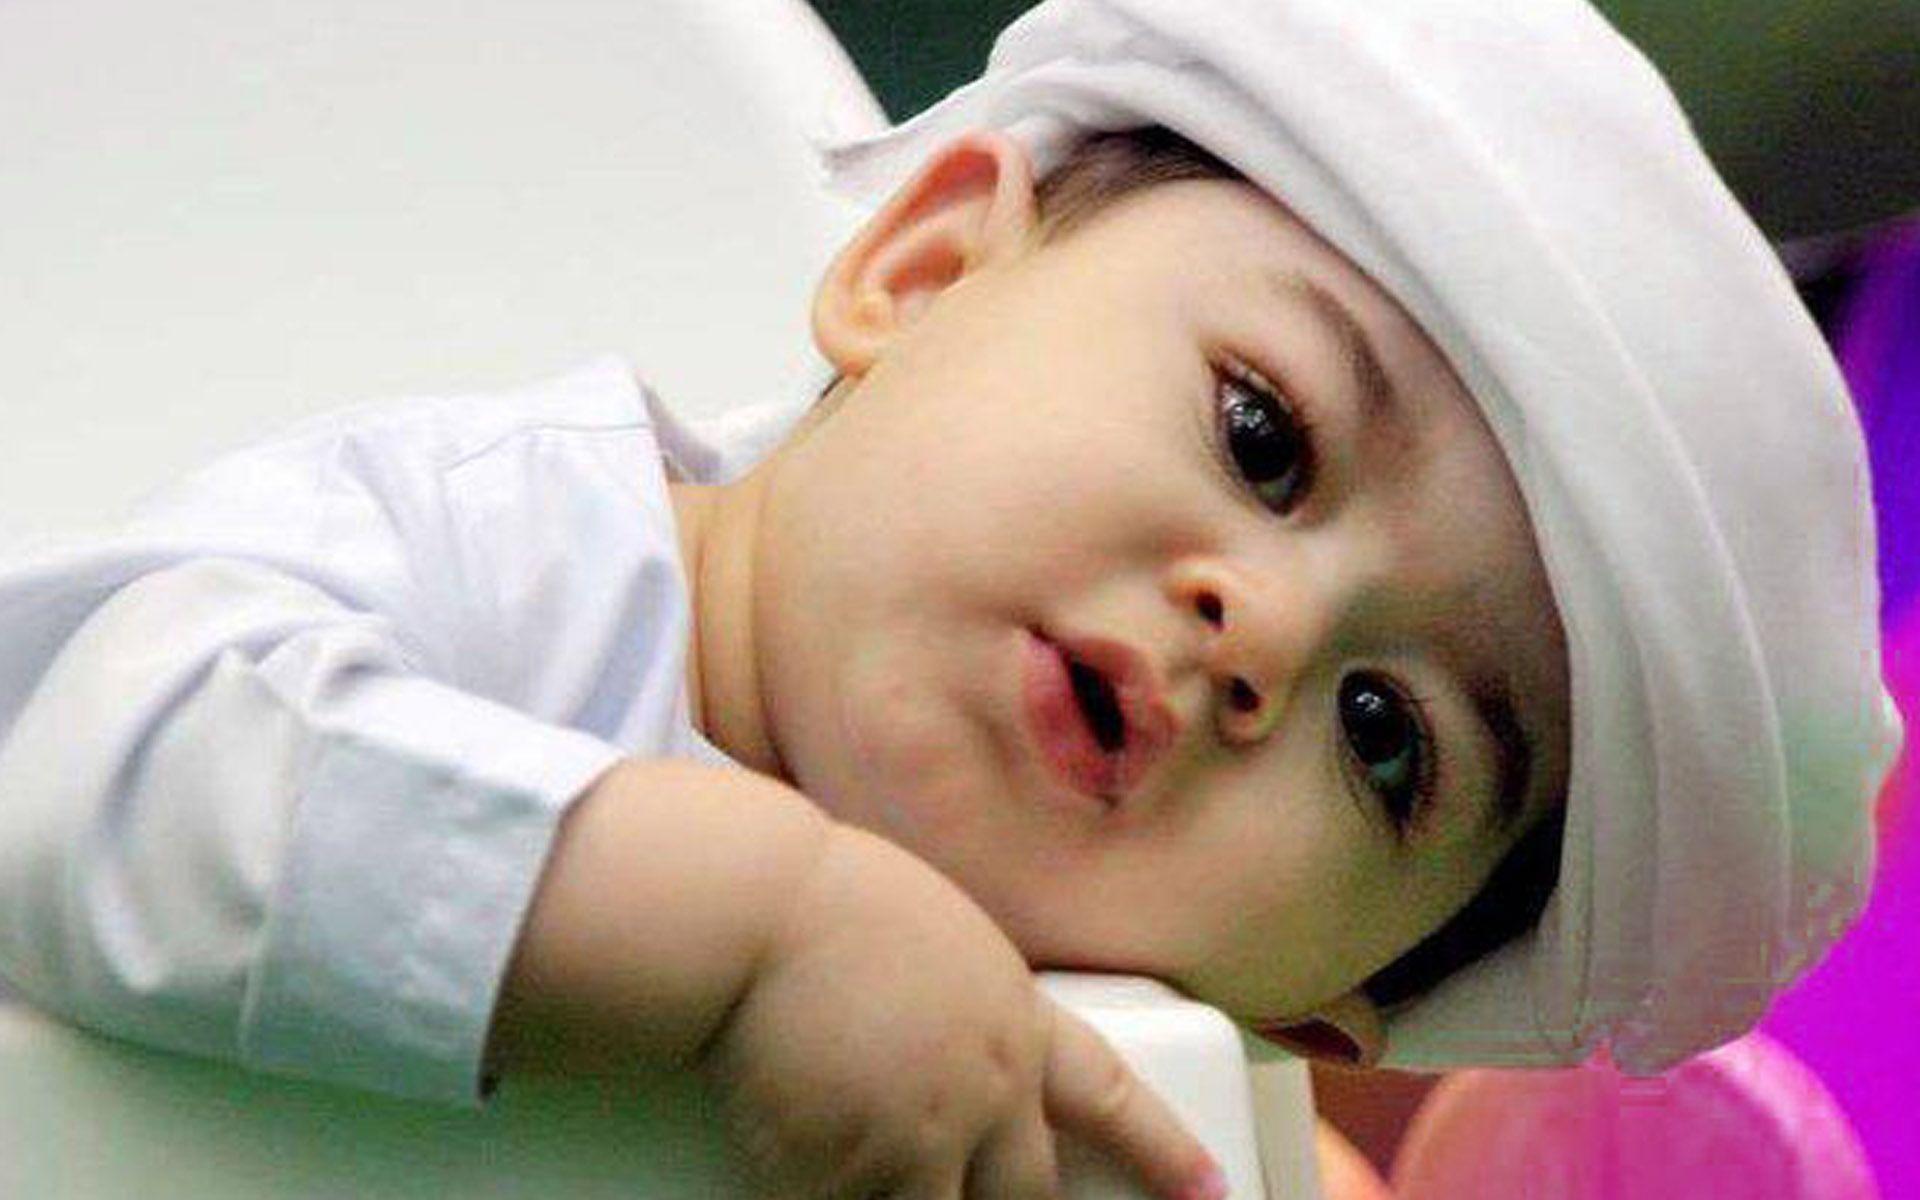 Cute Baby Photos Gallery Boy Secondtofirst Com